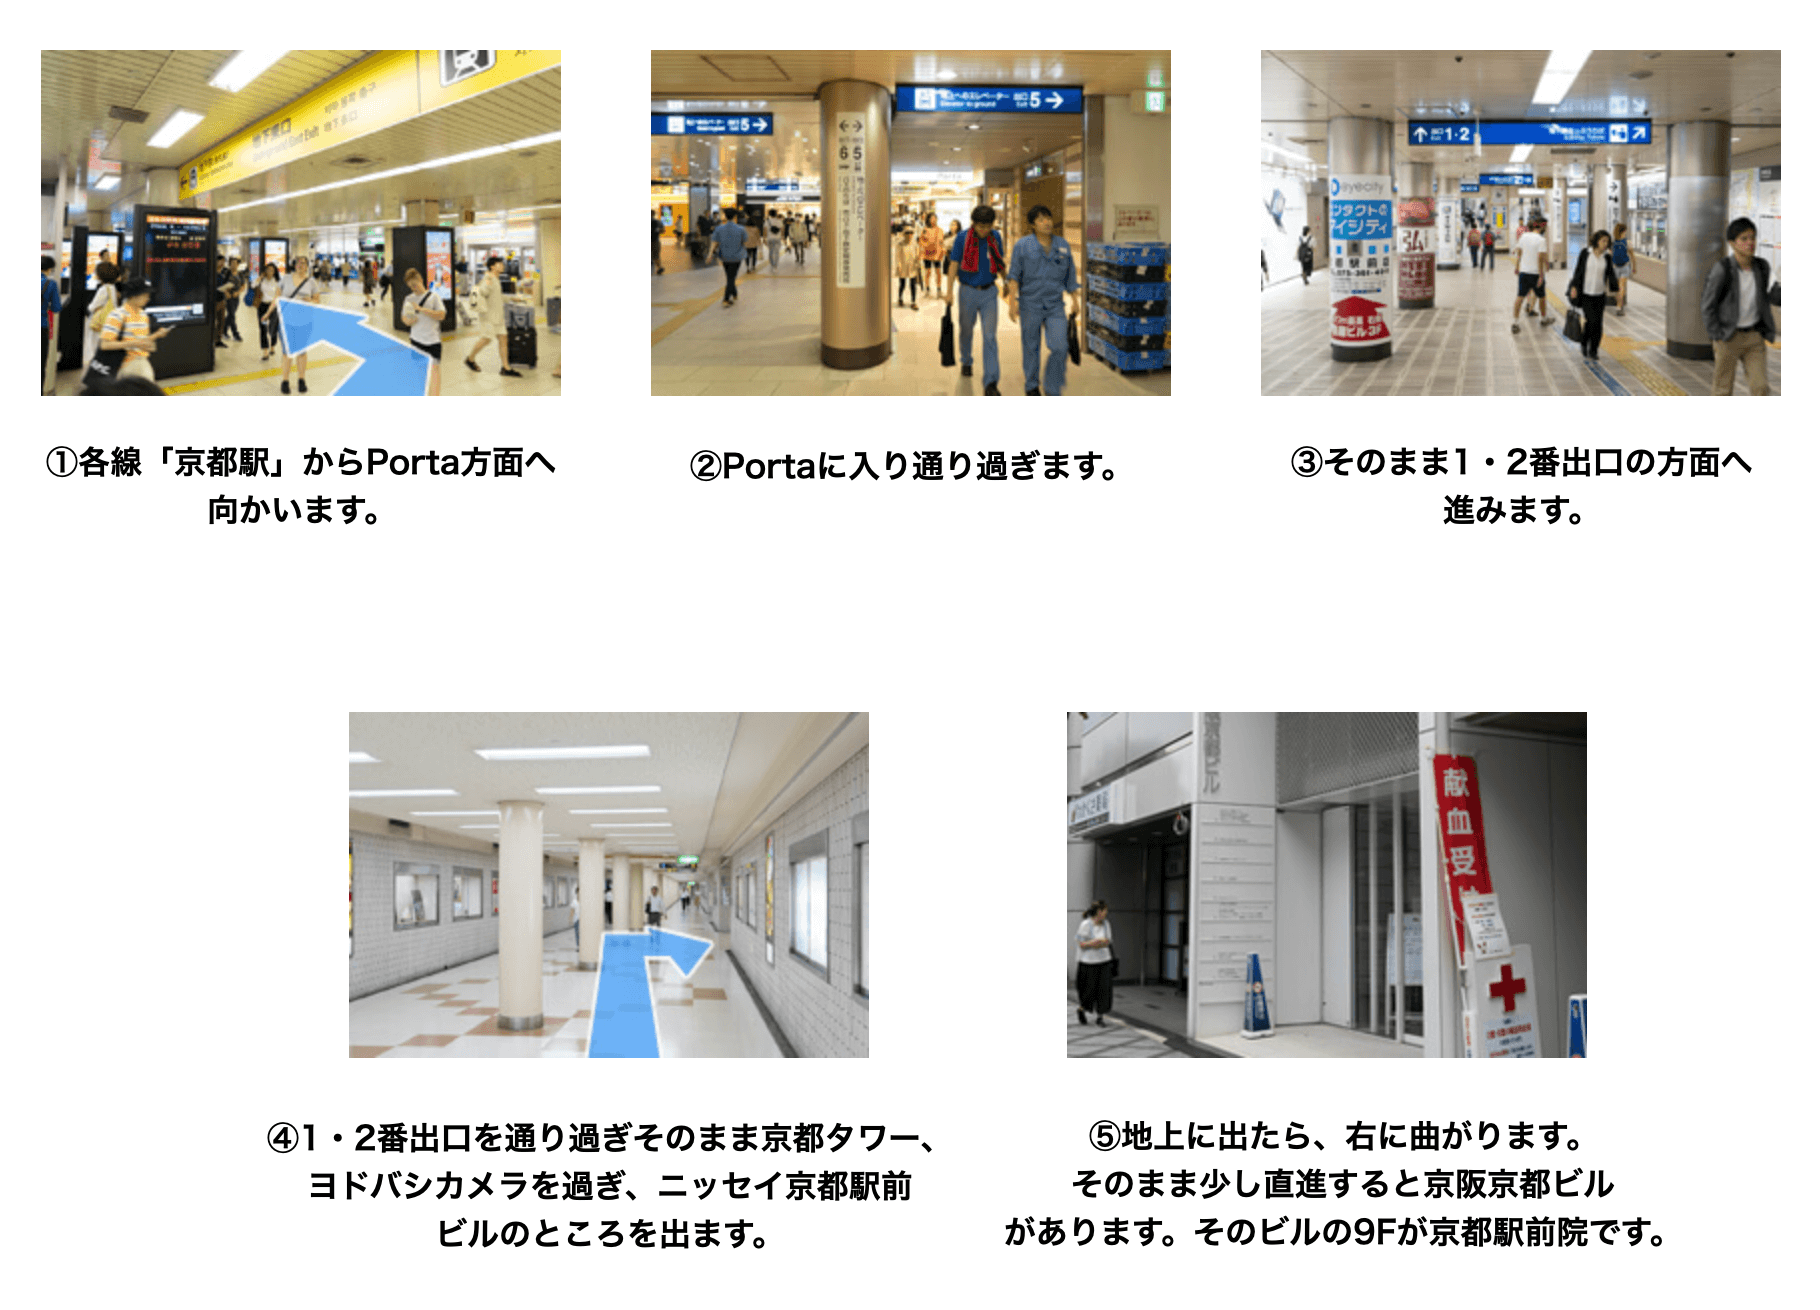 AGAスキンクリニック京都駅前院に迷わず辿り着くための完全MAP